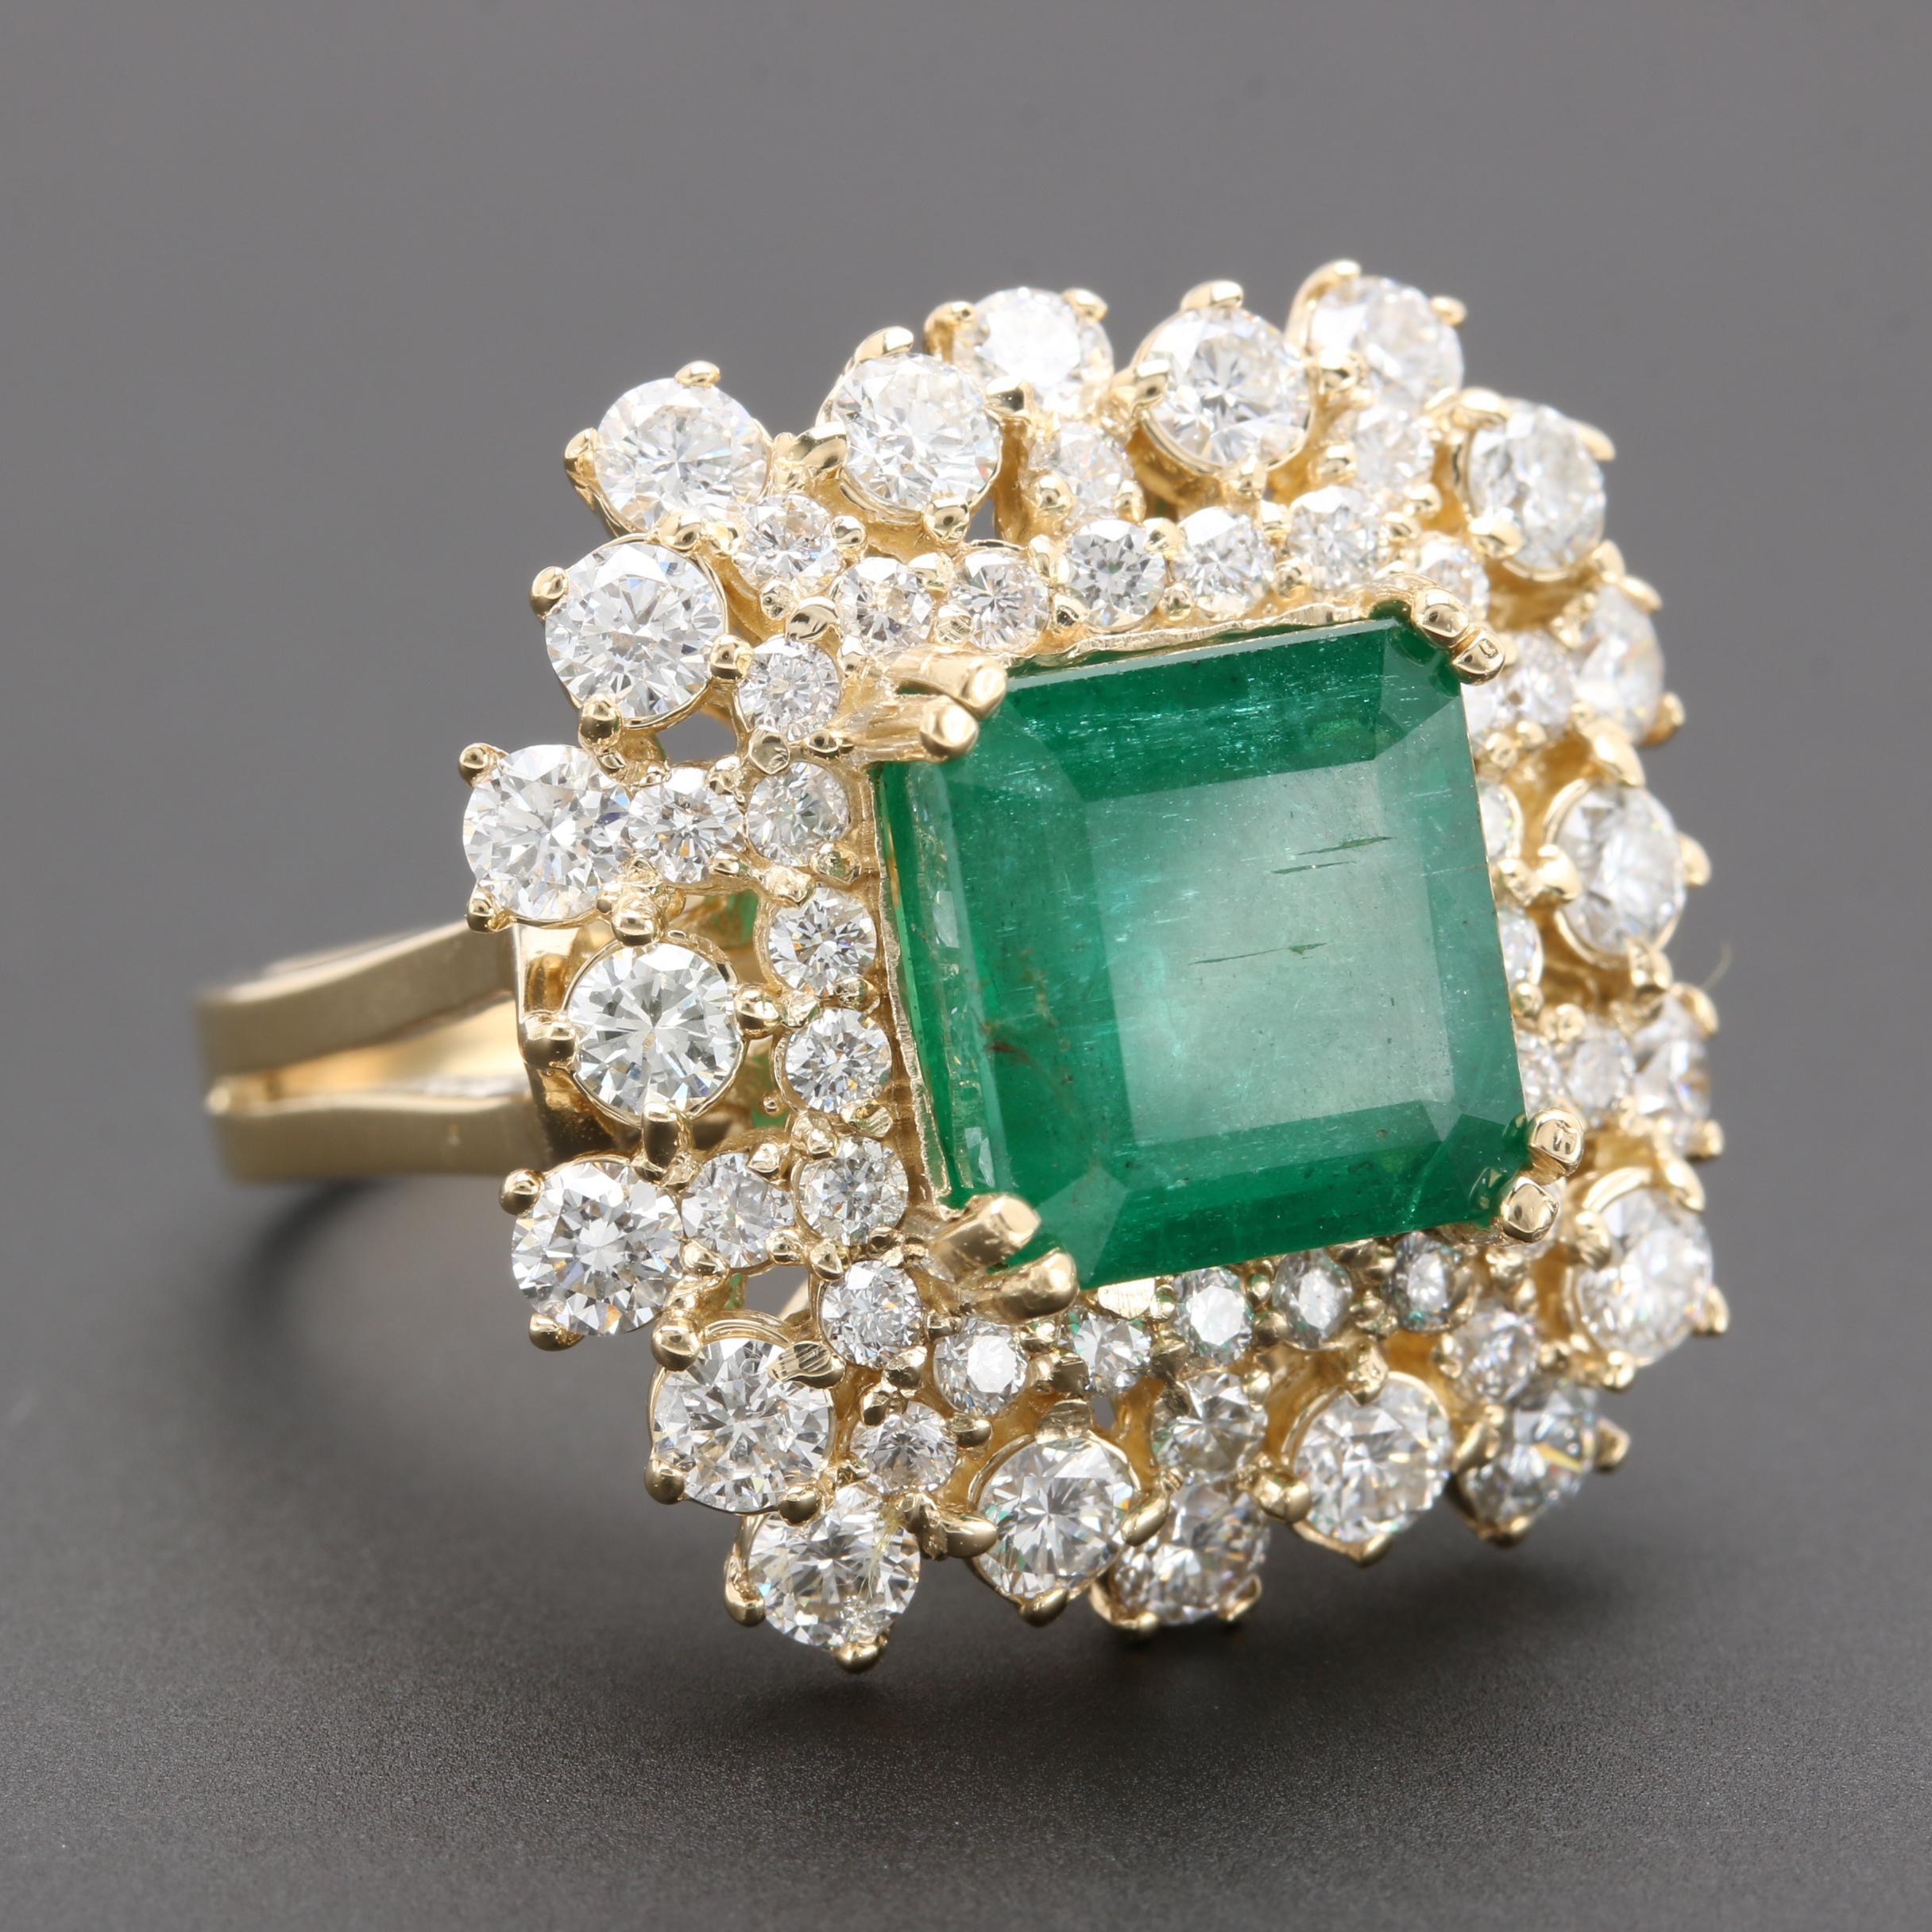 14K Yellow Gold 4.51 CT Emerald and 1.97 CTW Diamond Ring